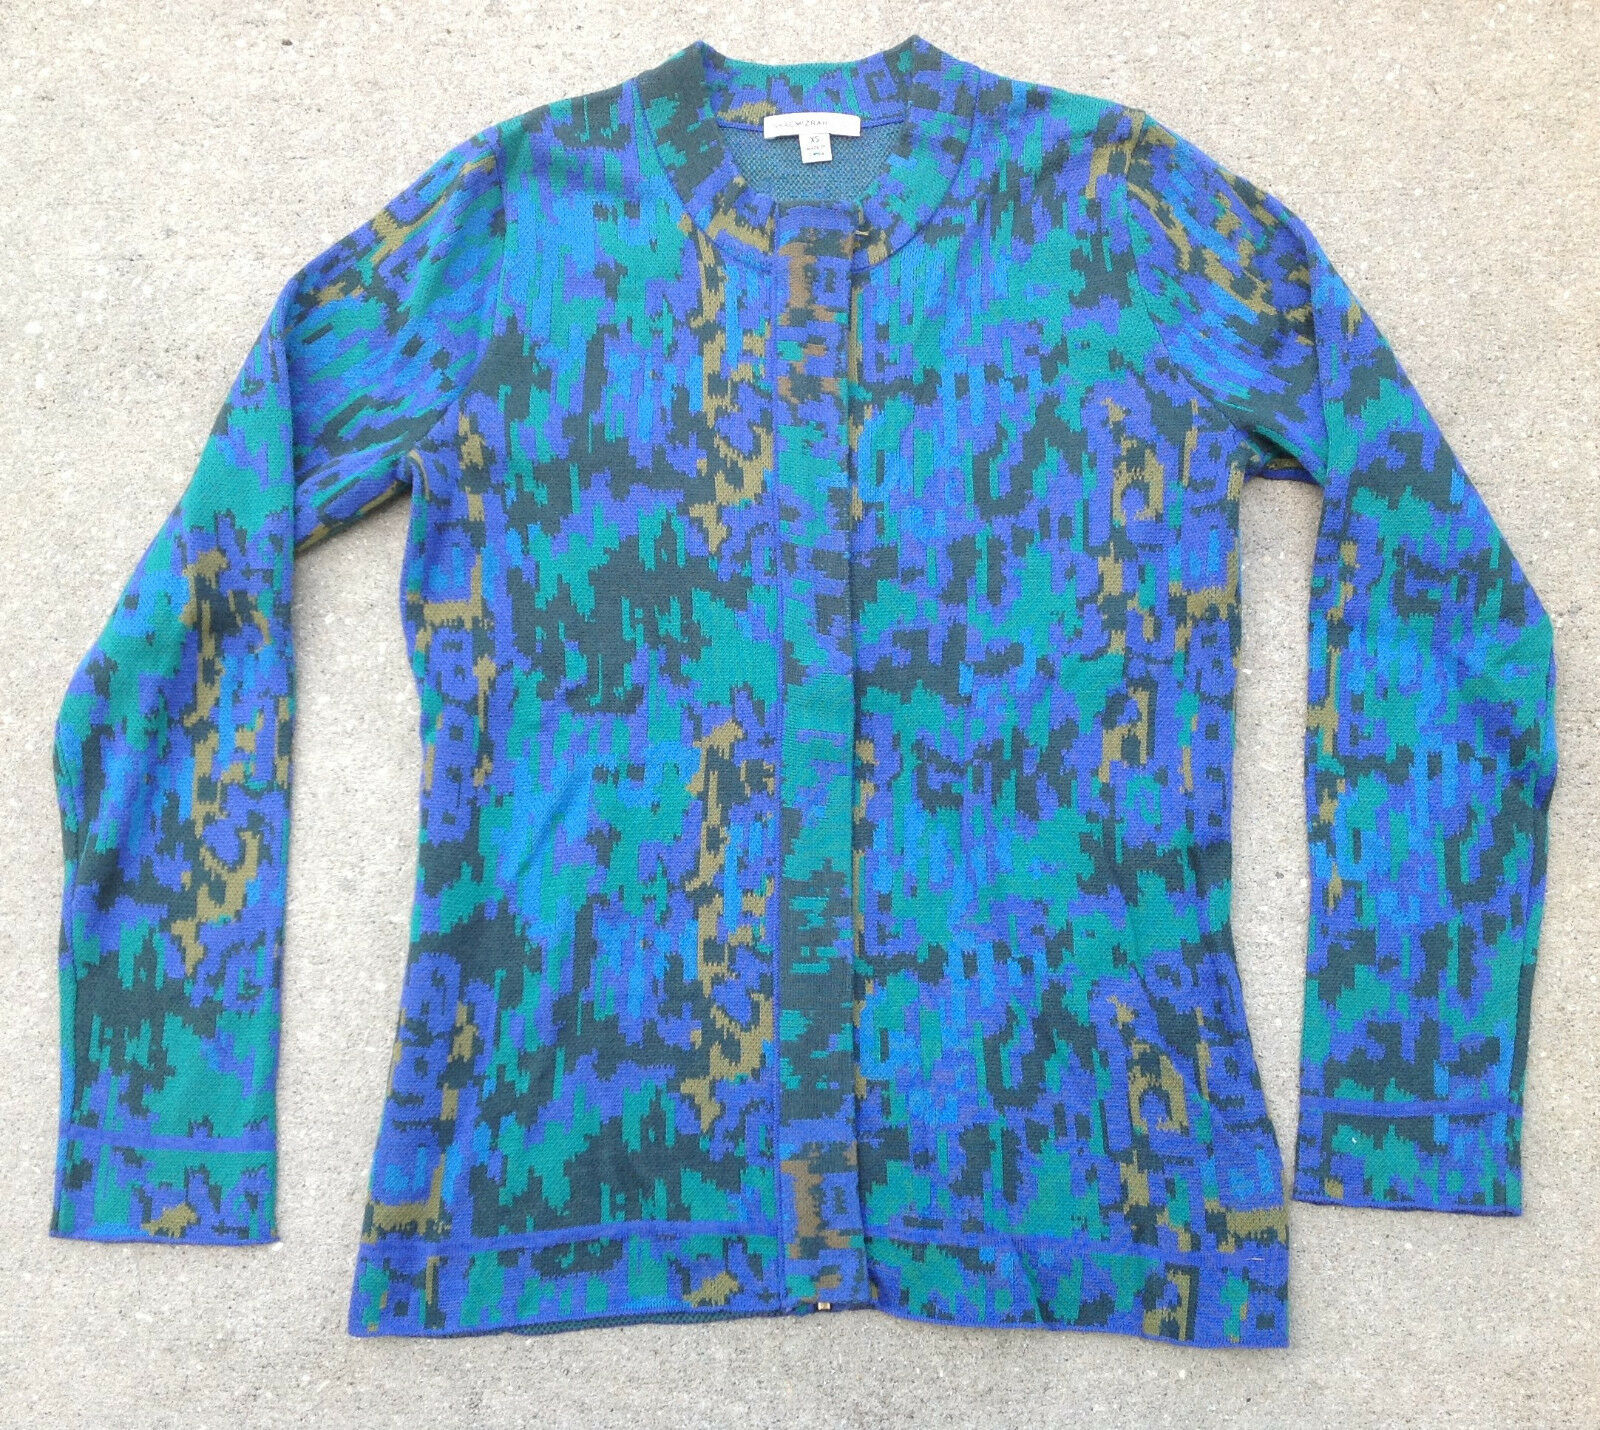 Isaac Mizrahi Live  Abstract Animal Jacquard Zip Cardigan, Size XL, MSRP